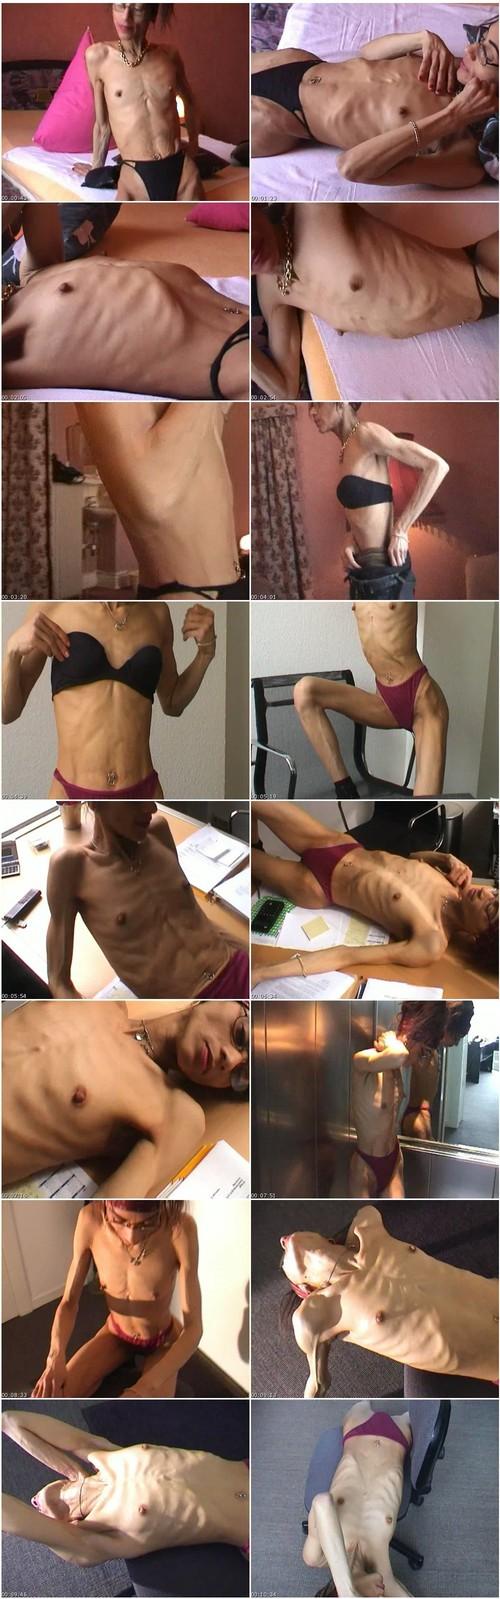 http://ist5-1.filesor.com/pimpandhost.com/9/6/8/3/96838/6/2/u/g/62ugQ/Anorexia077_thumb_m.jpg